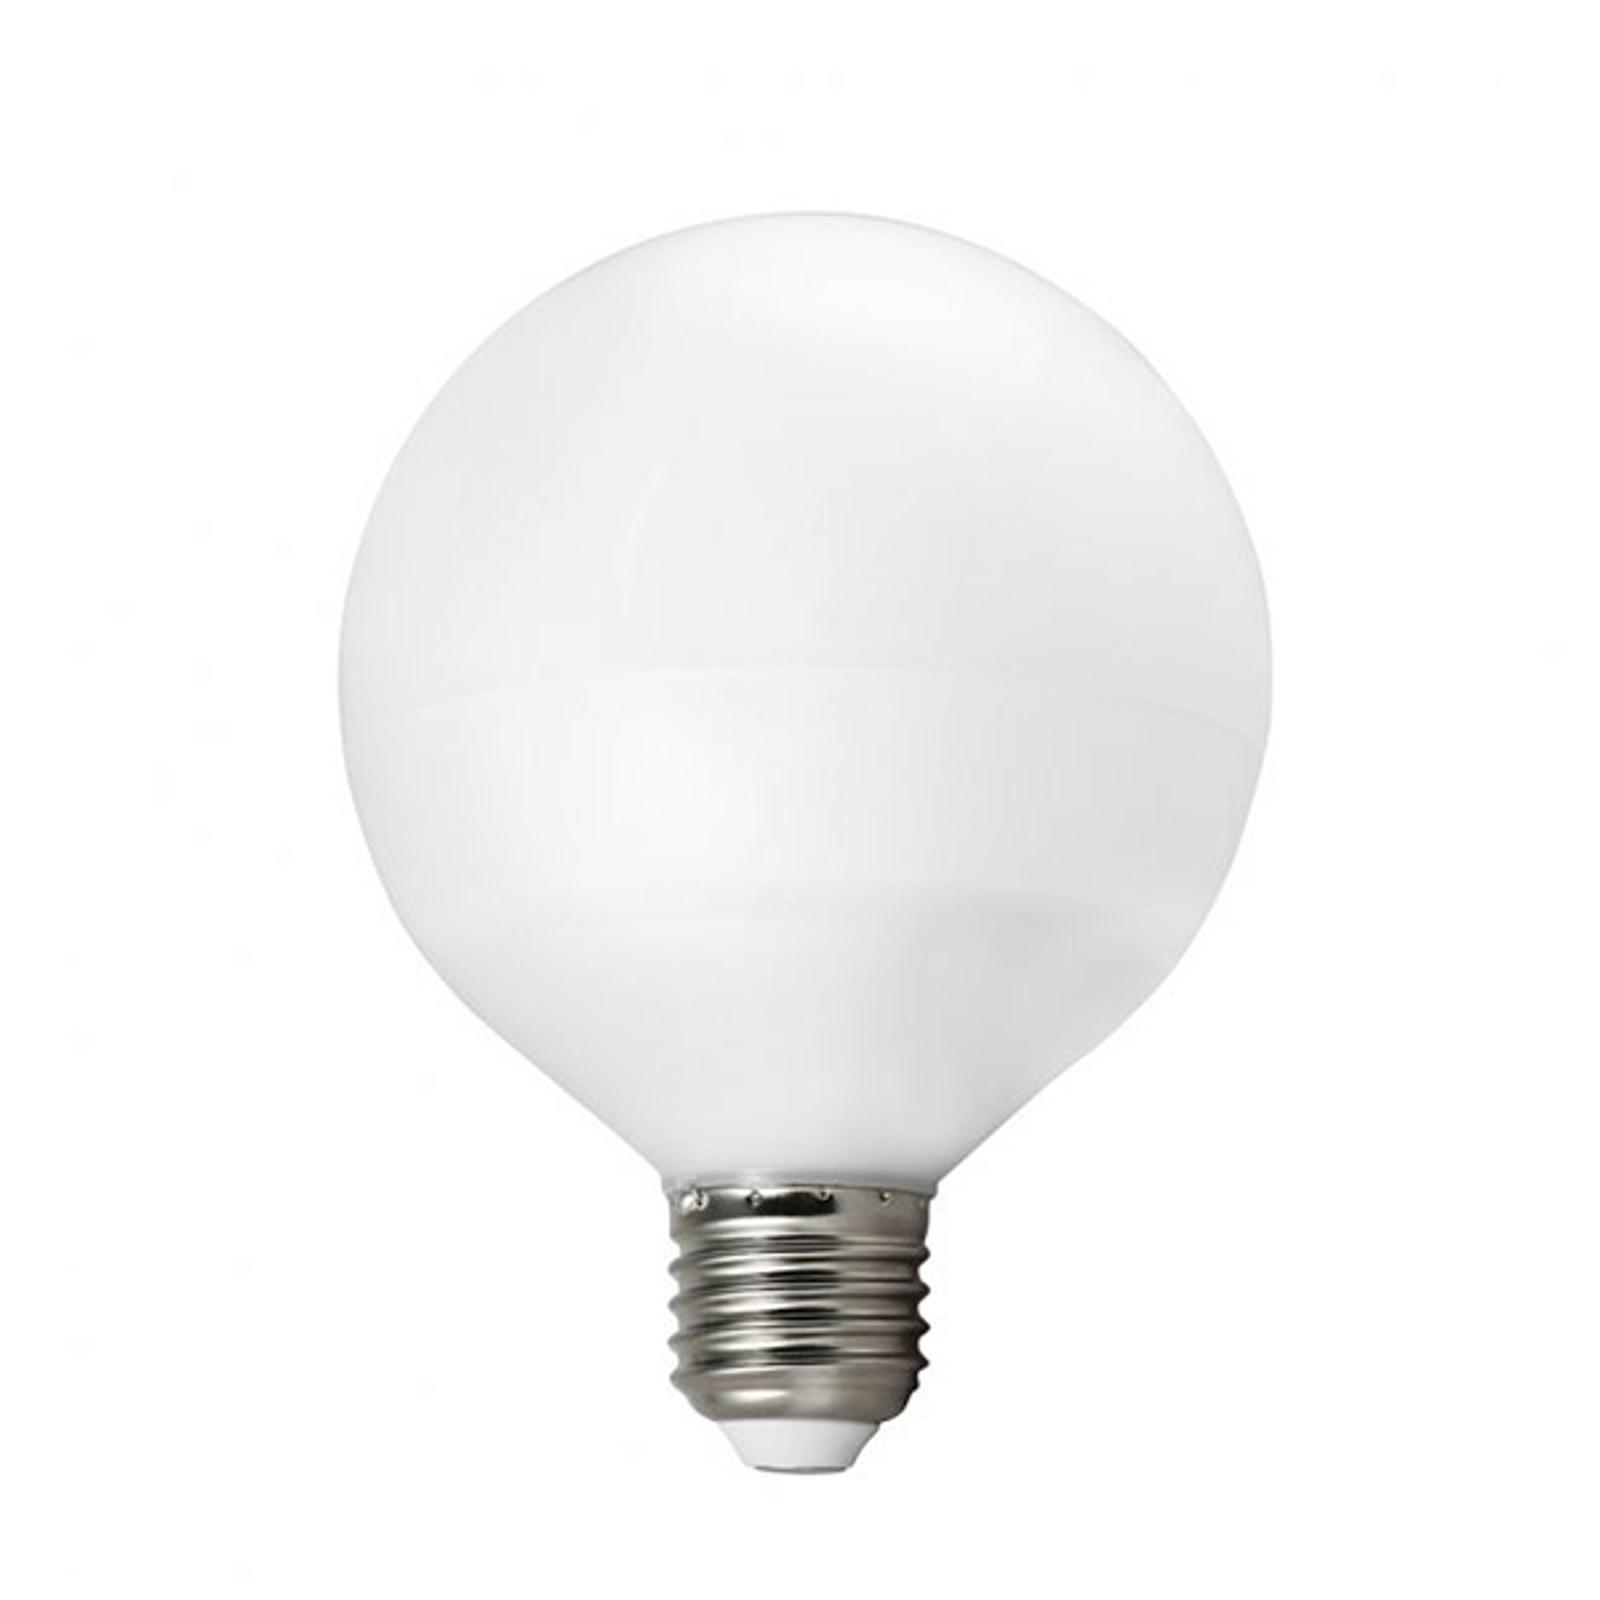 Ampoule globe LED E27 13W 827 G95, blanc chaud